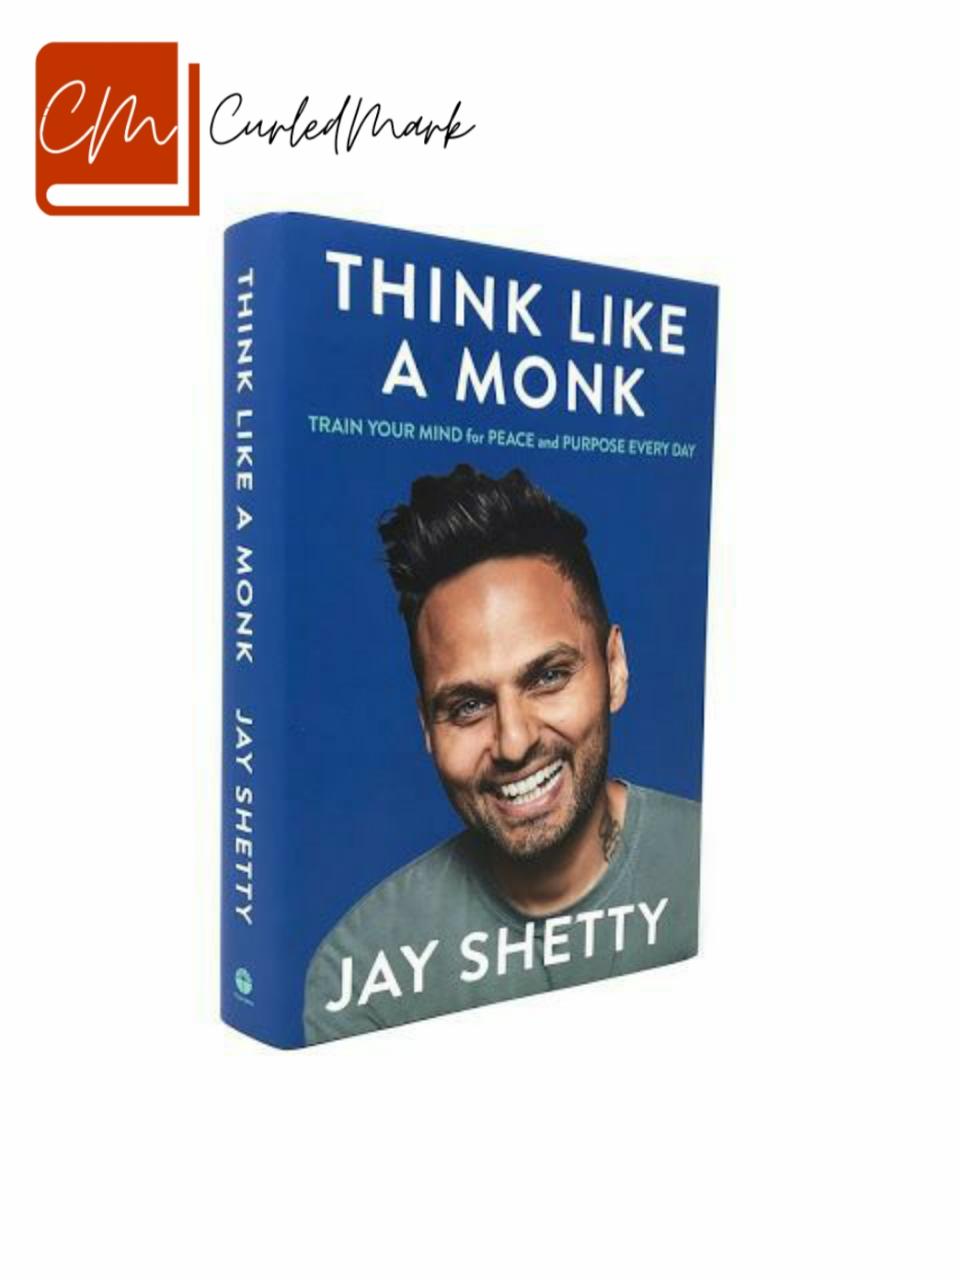 Think Like a Monk Summary By Santwana Mohanty